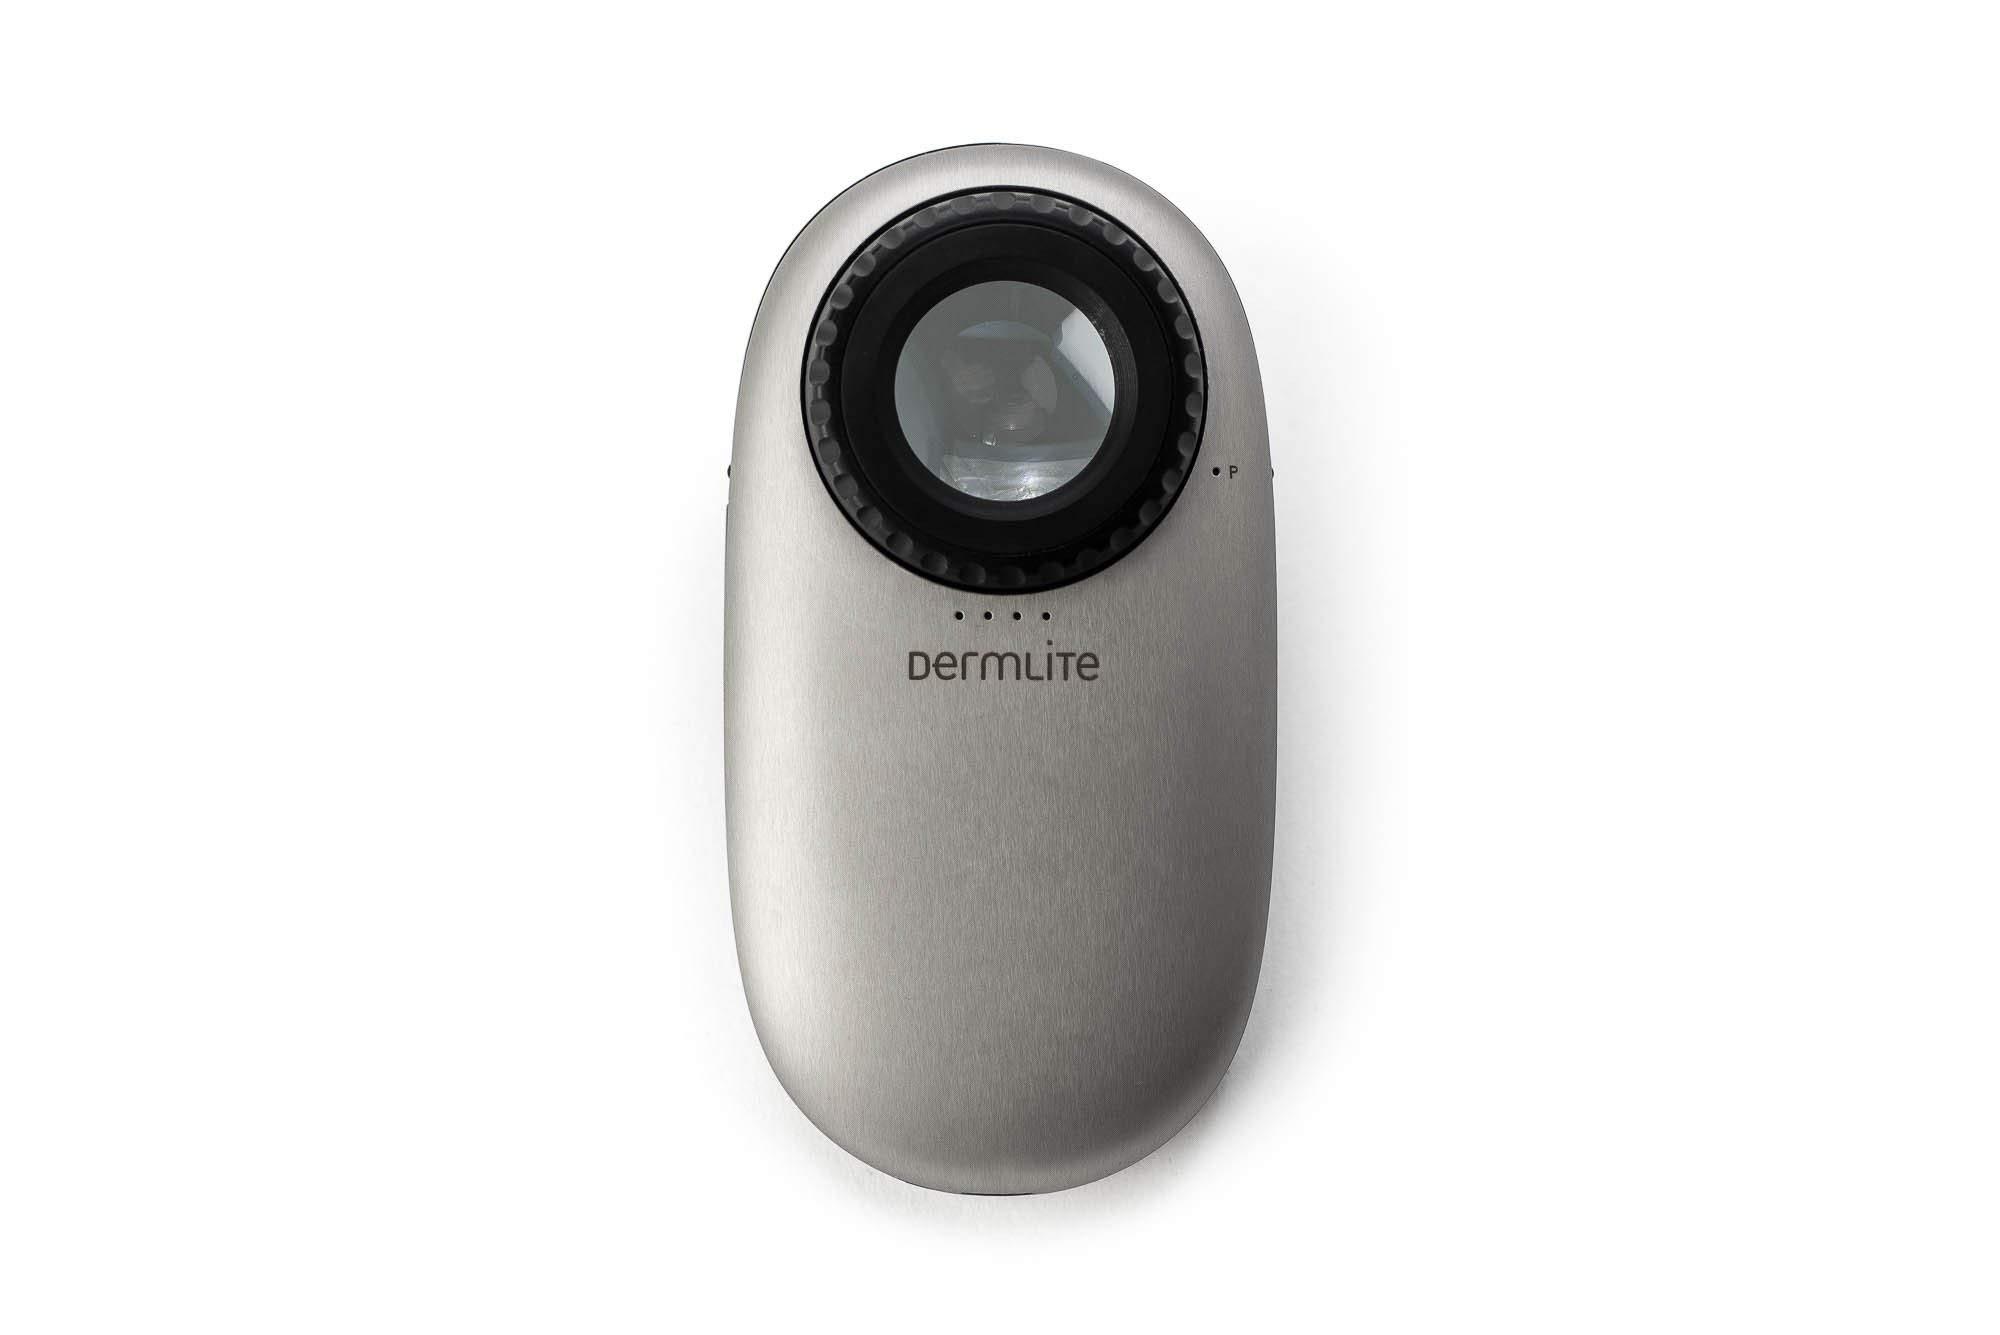 3Gen DermLite Hybrid Polarized Dermascope